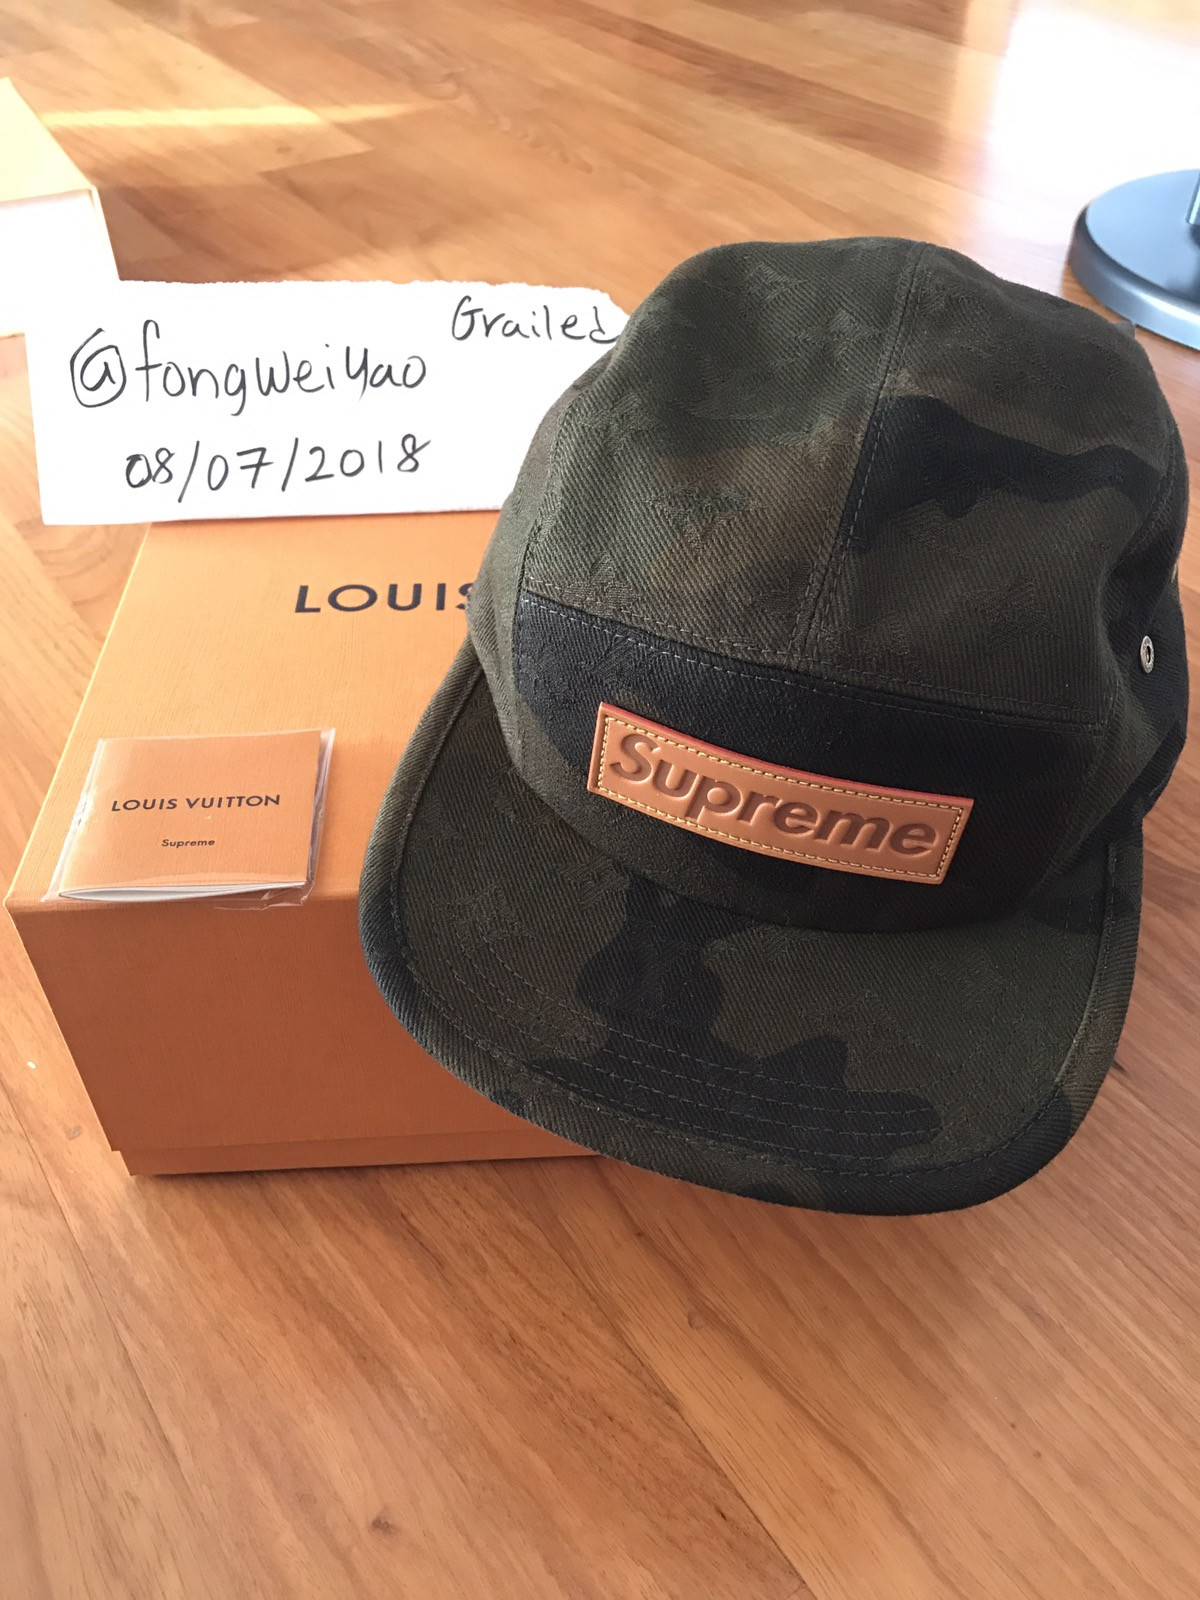 6dc8f3a1140 Supreme 5 Panel LV Monogram x Supreme BOGO Cap Size one size - Hats for  Sale - Grailed